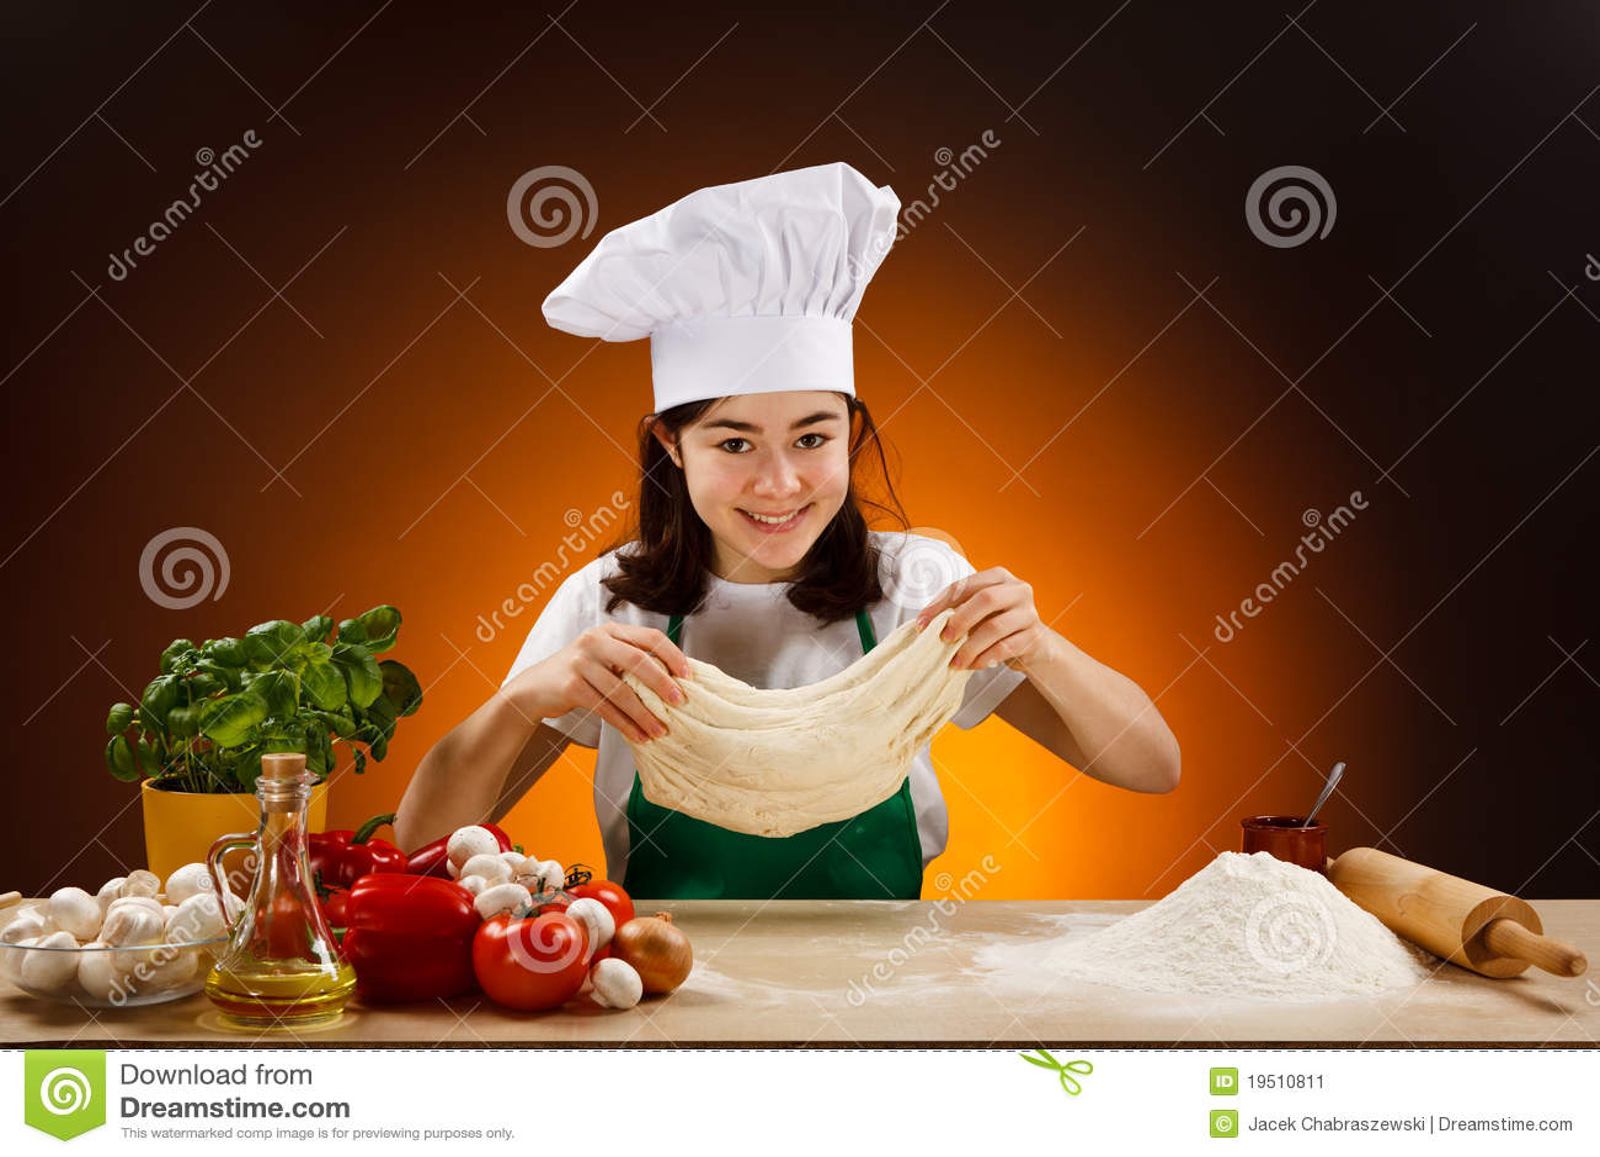 Girl making pizza dough